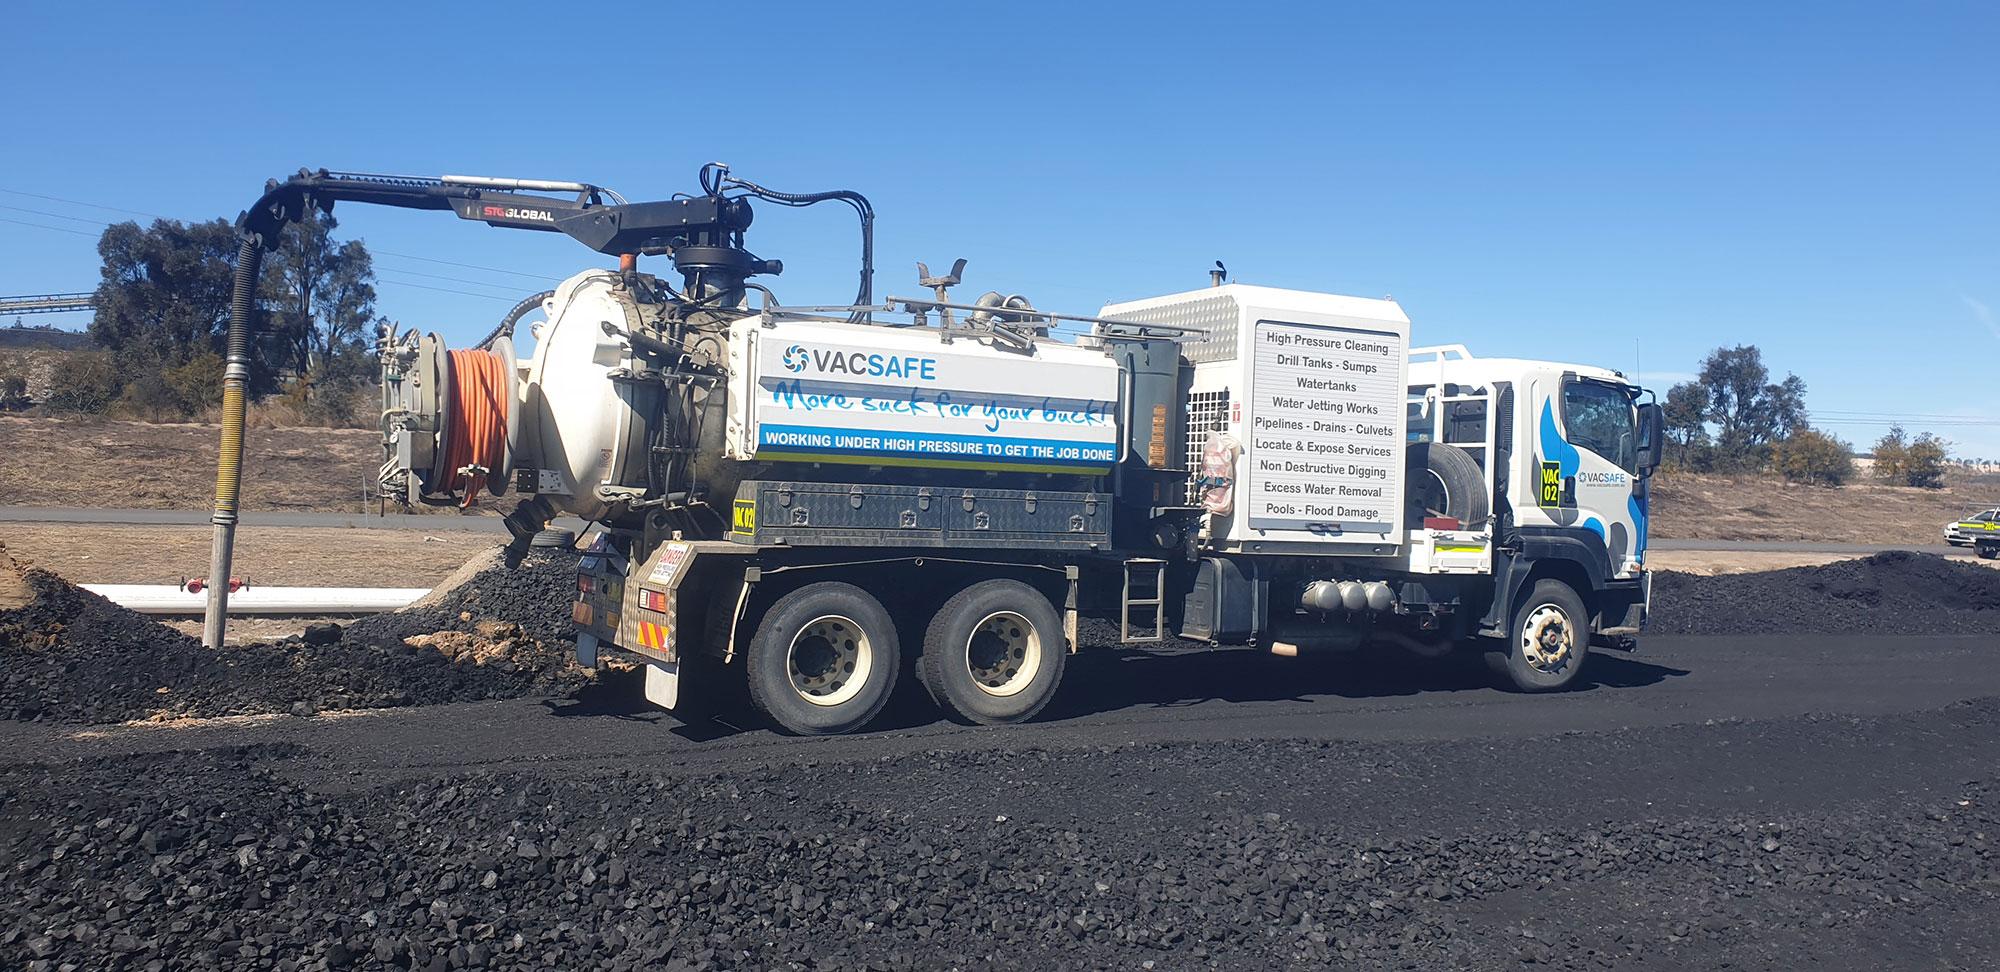 Vacsafe-Vav-truck-NDD-Non-Destructive-Digging-6000l-sucker-truck-hire-mudgee